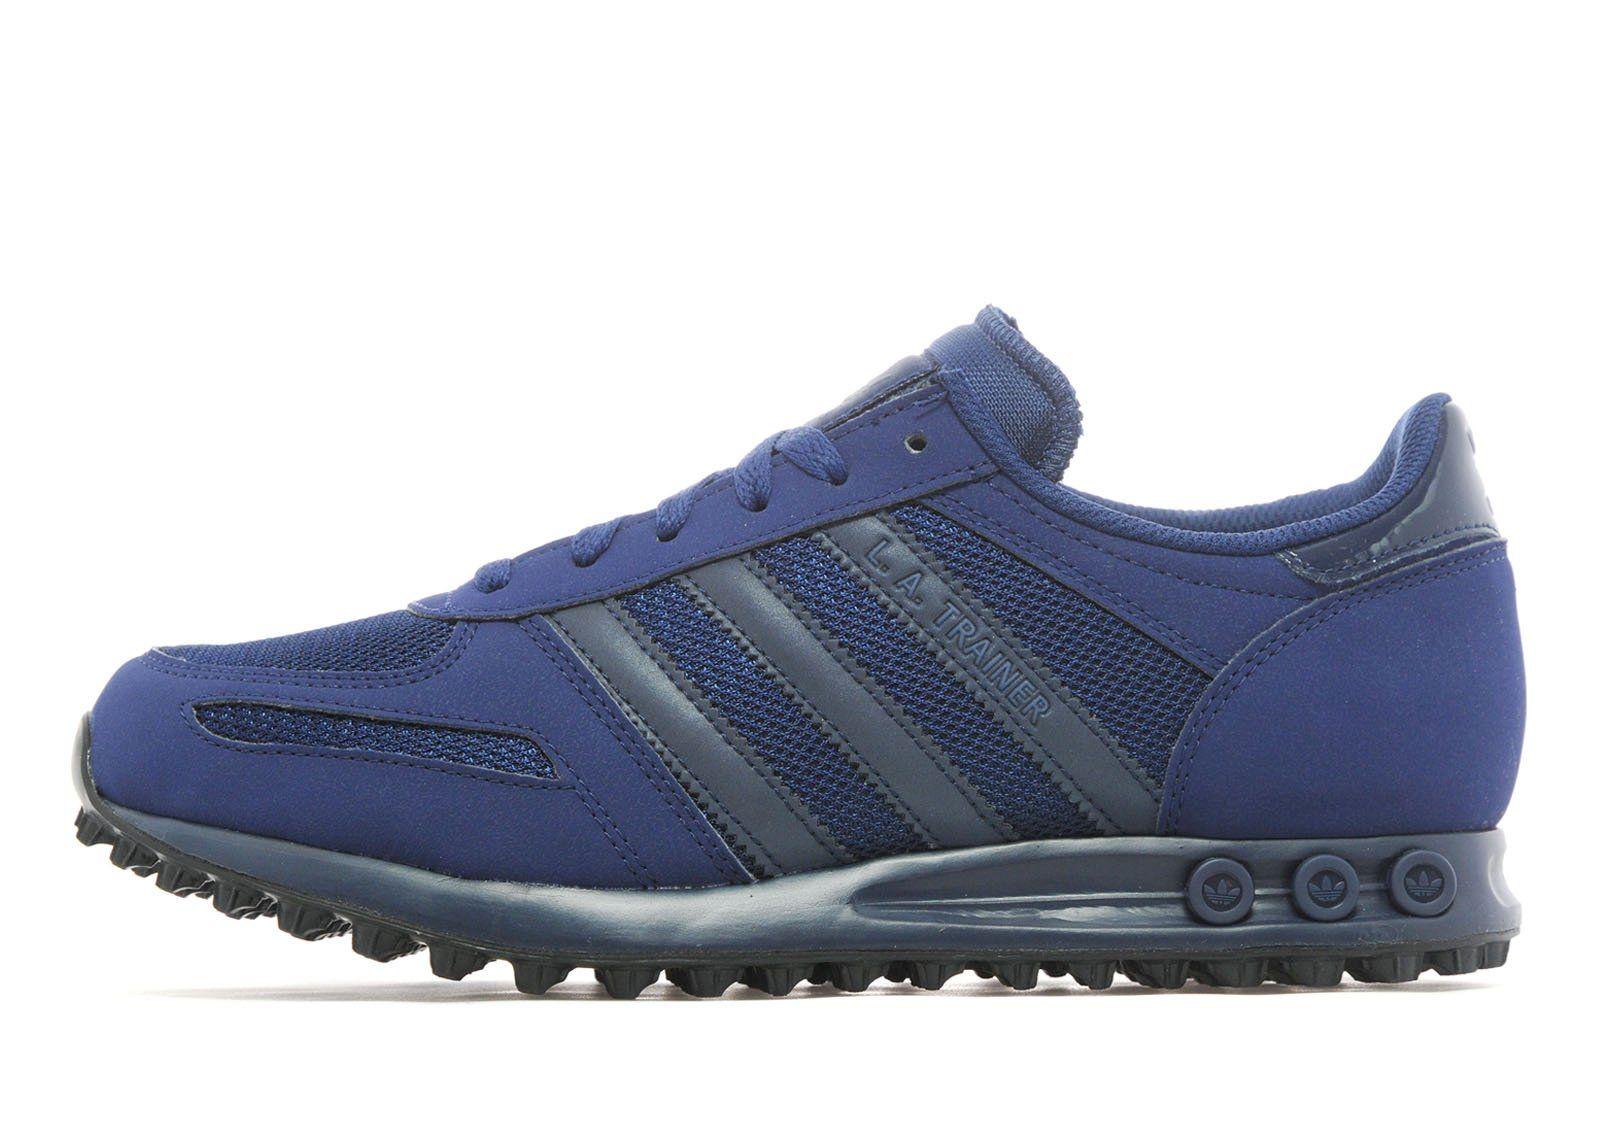 check out 808e4 1b7aa Adidas La Trainer Weave Blue